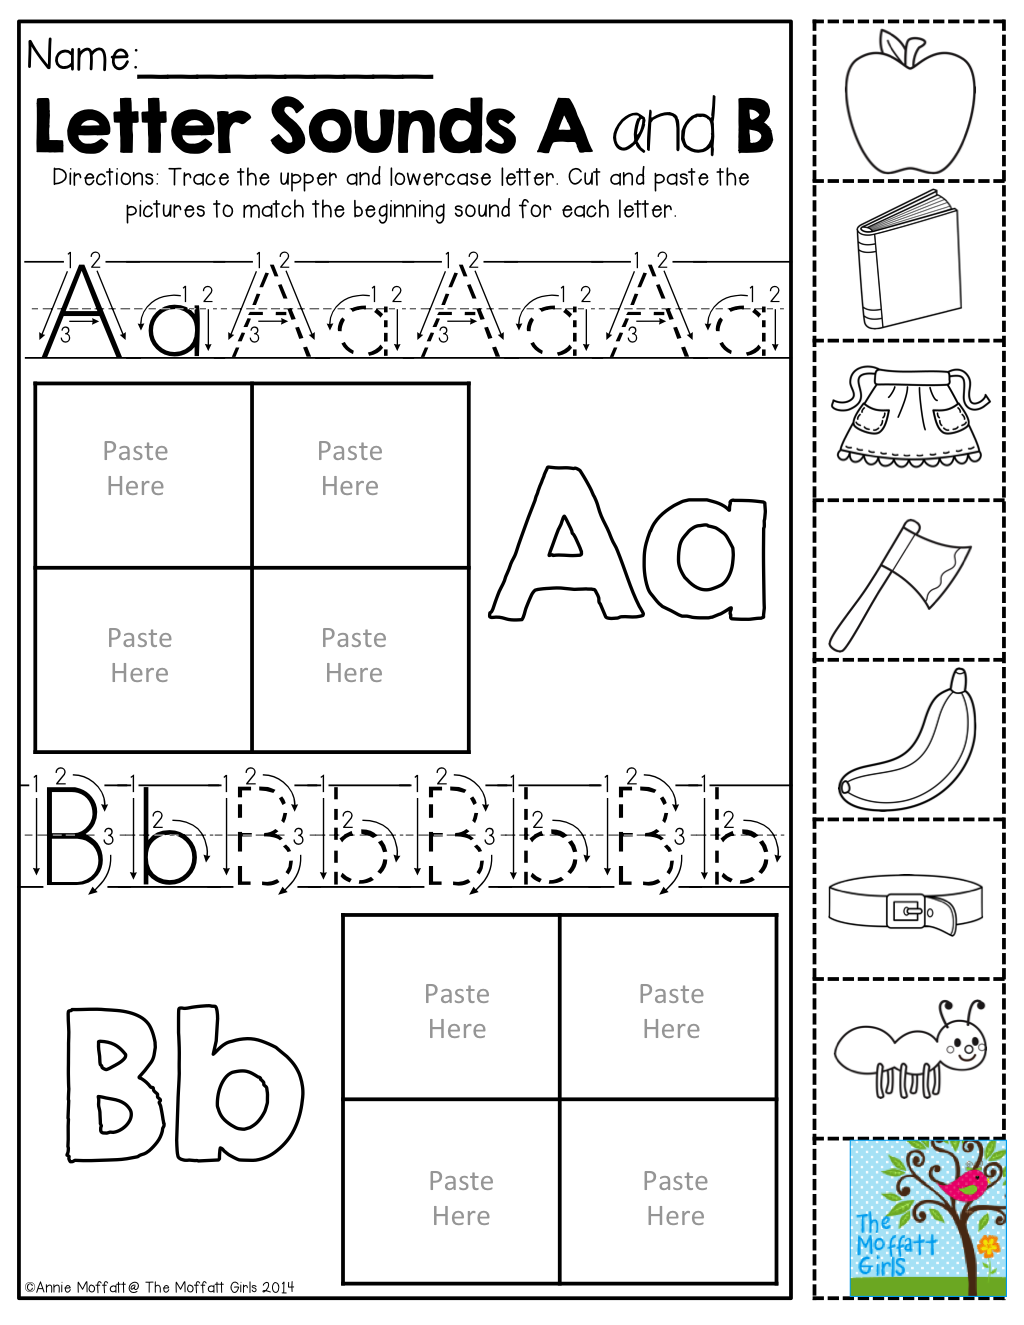 worksheet Letter Sound Worksheets For Pre K back to school no prep math and literacy packet kindergarten alphabet worksheetspreschool